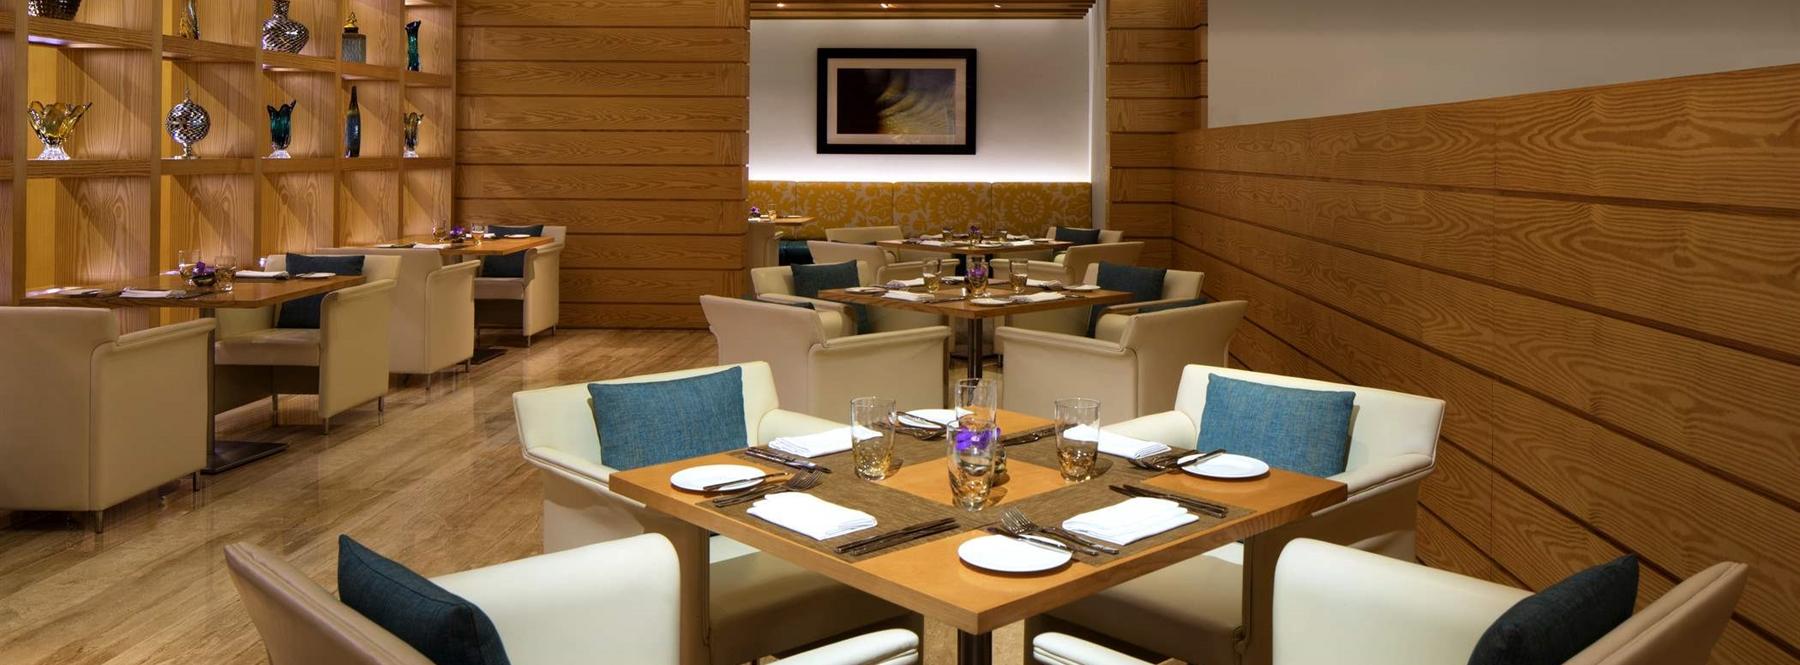 Fairways Restaurant Menu 2